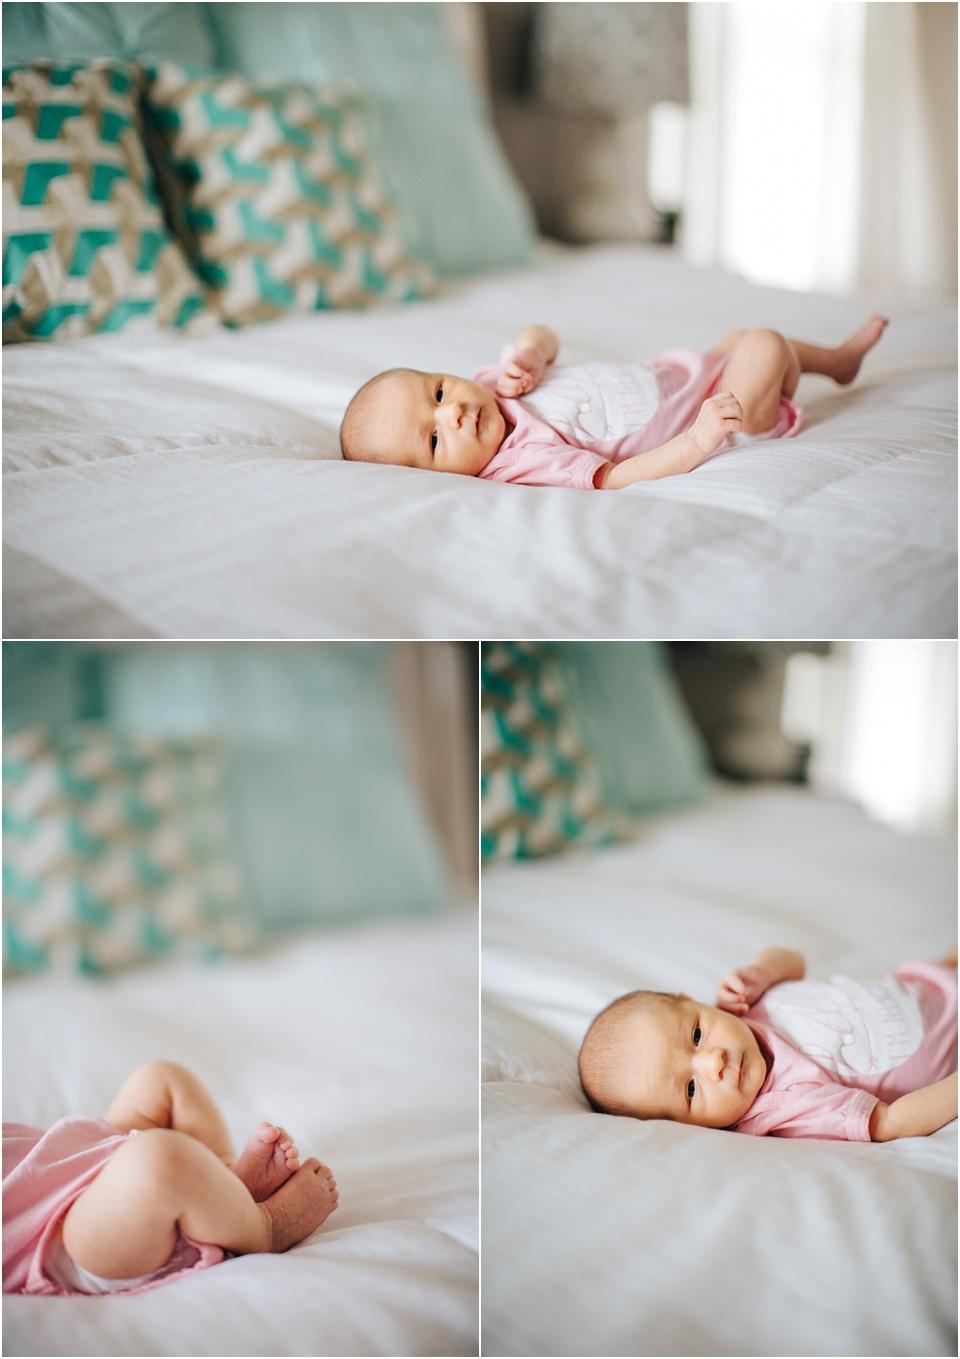 kansascitysbestnewbornphotographer_0006